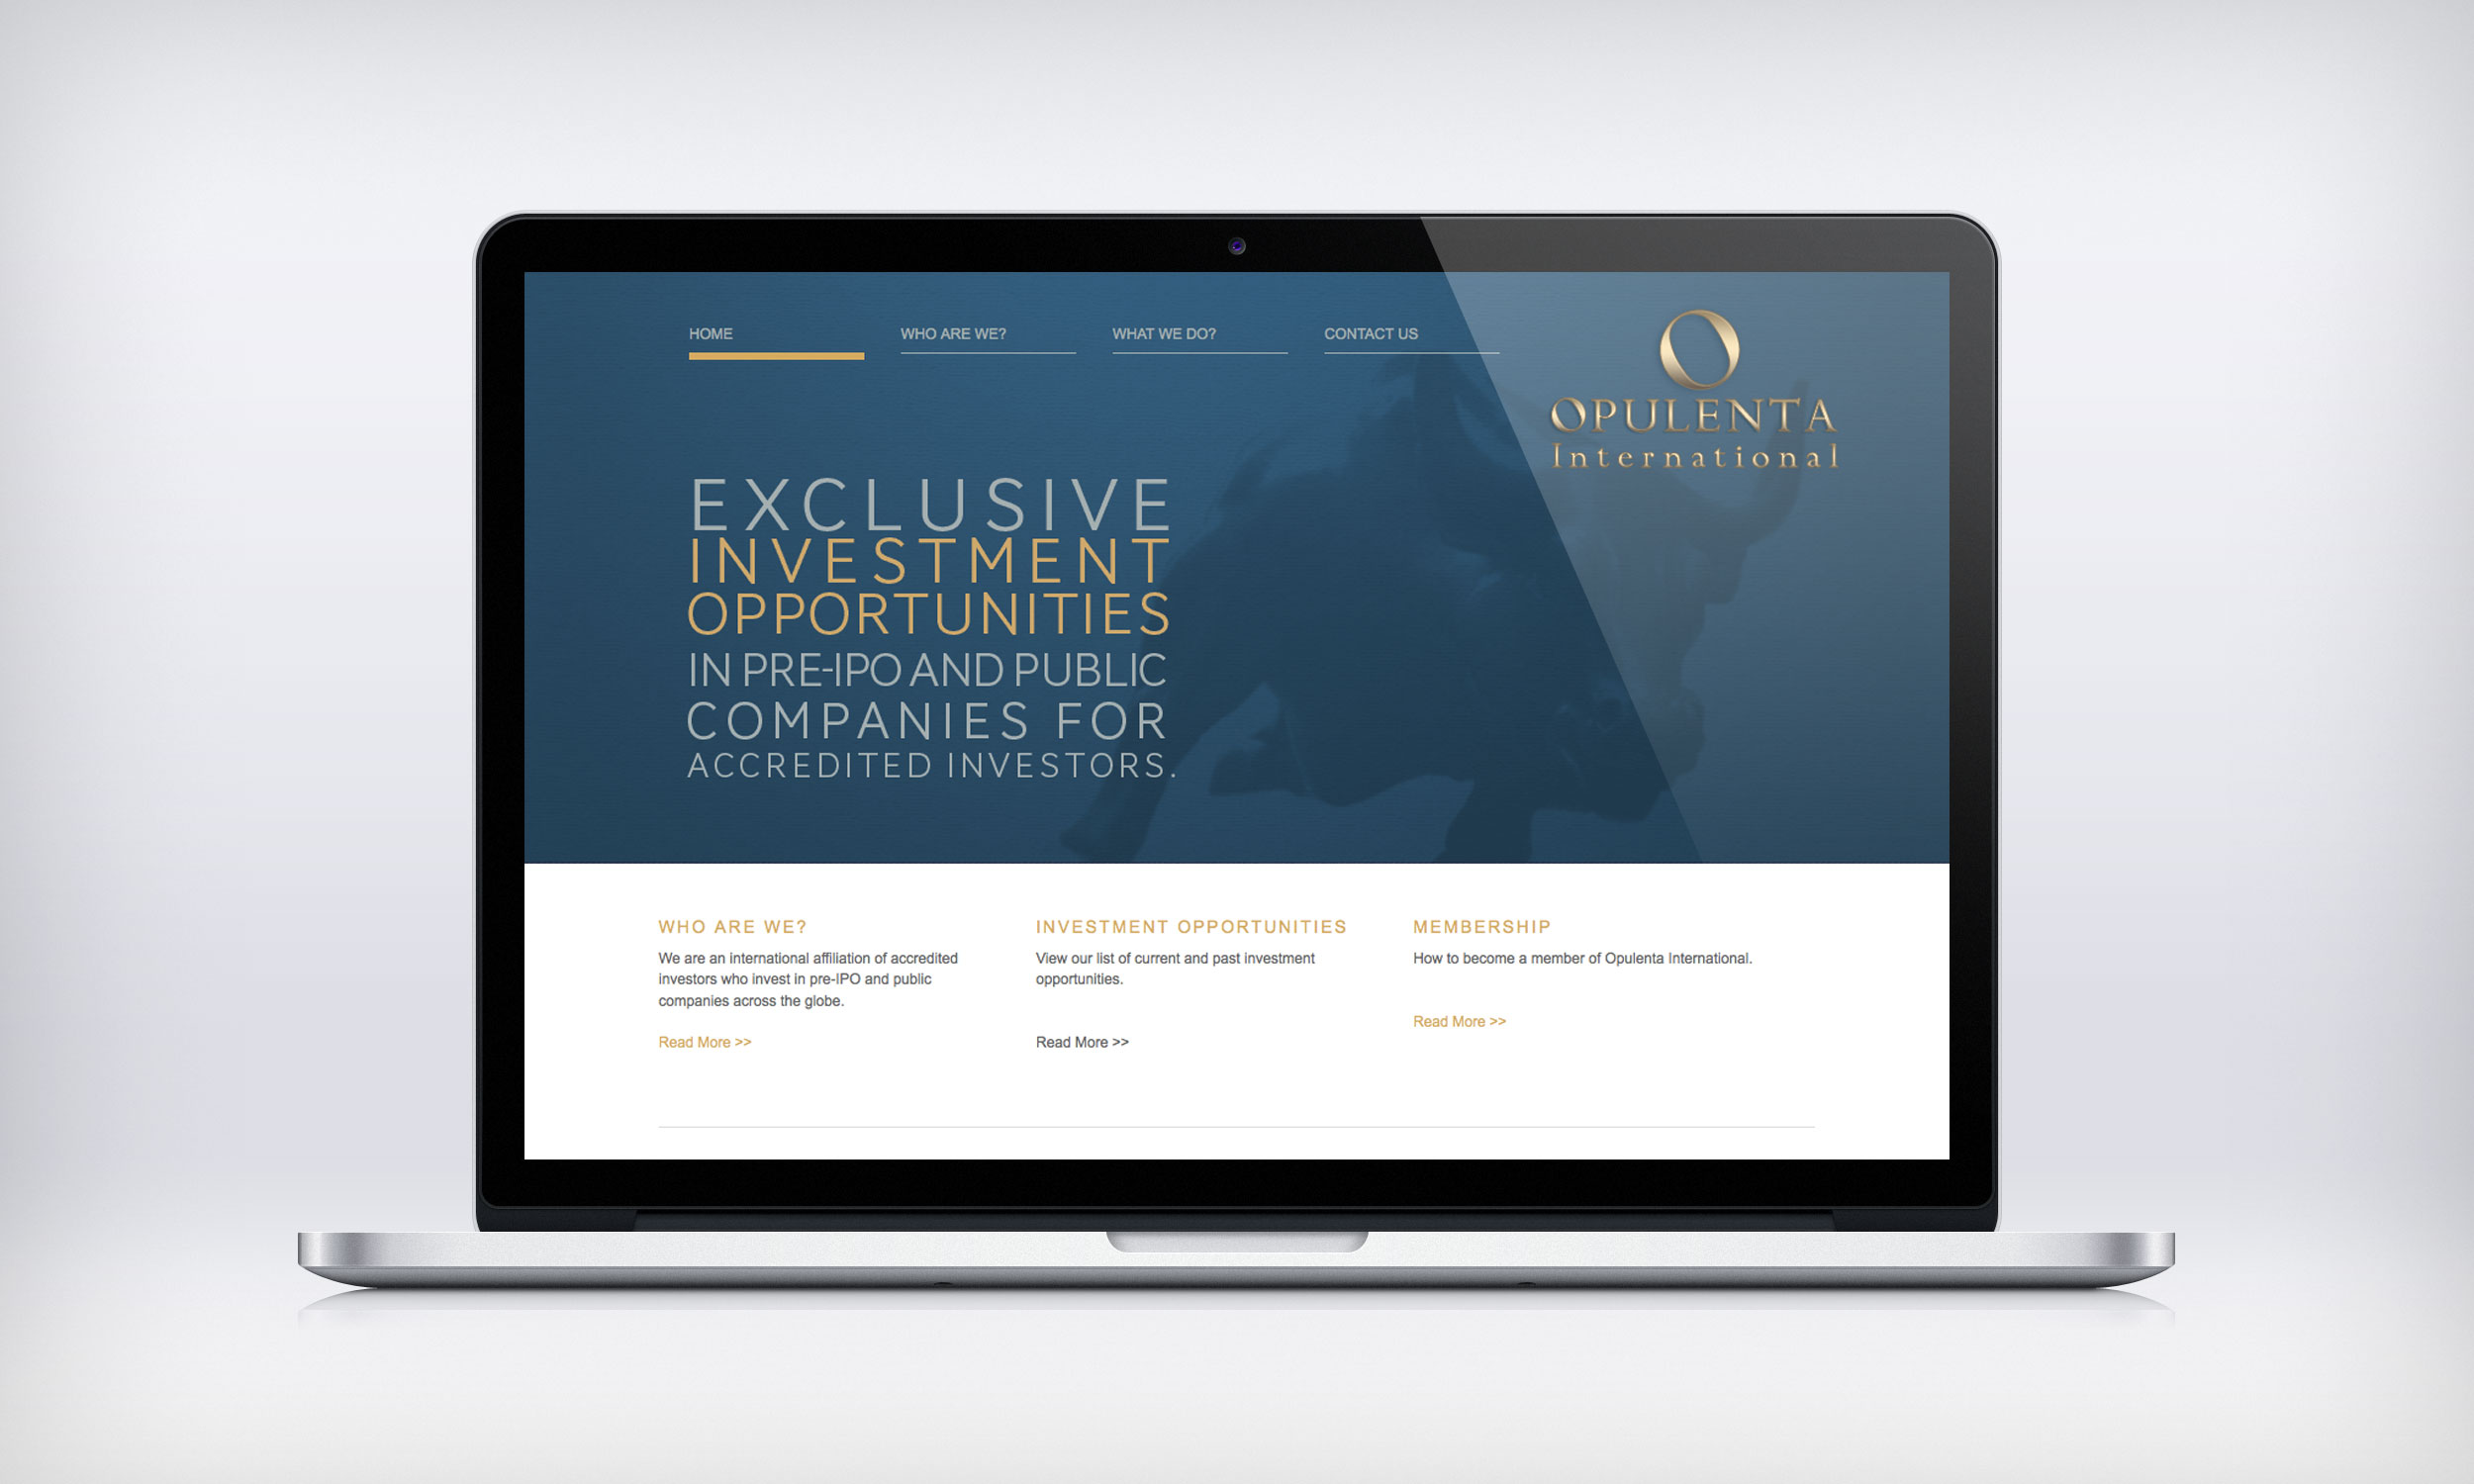 opulenta website